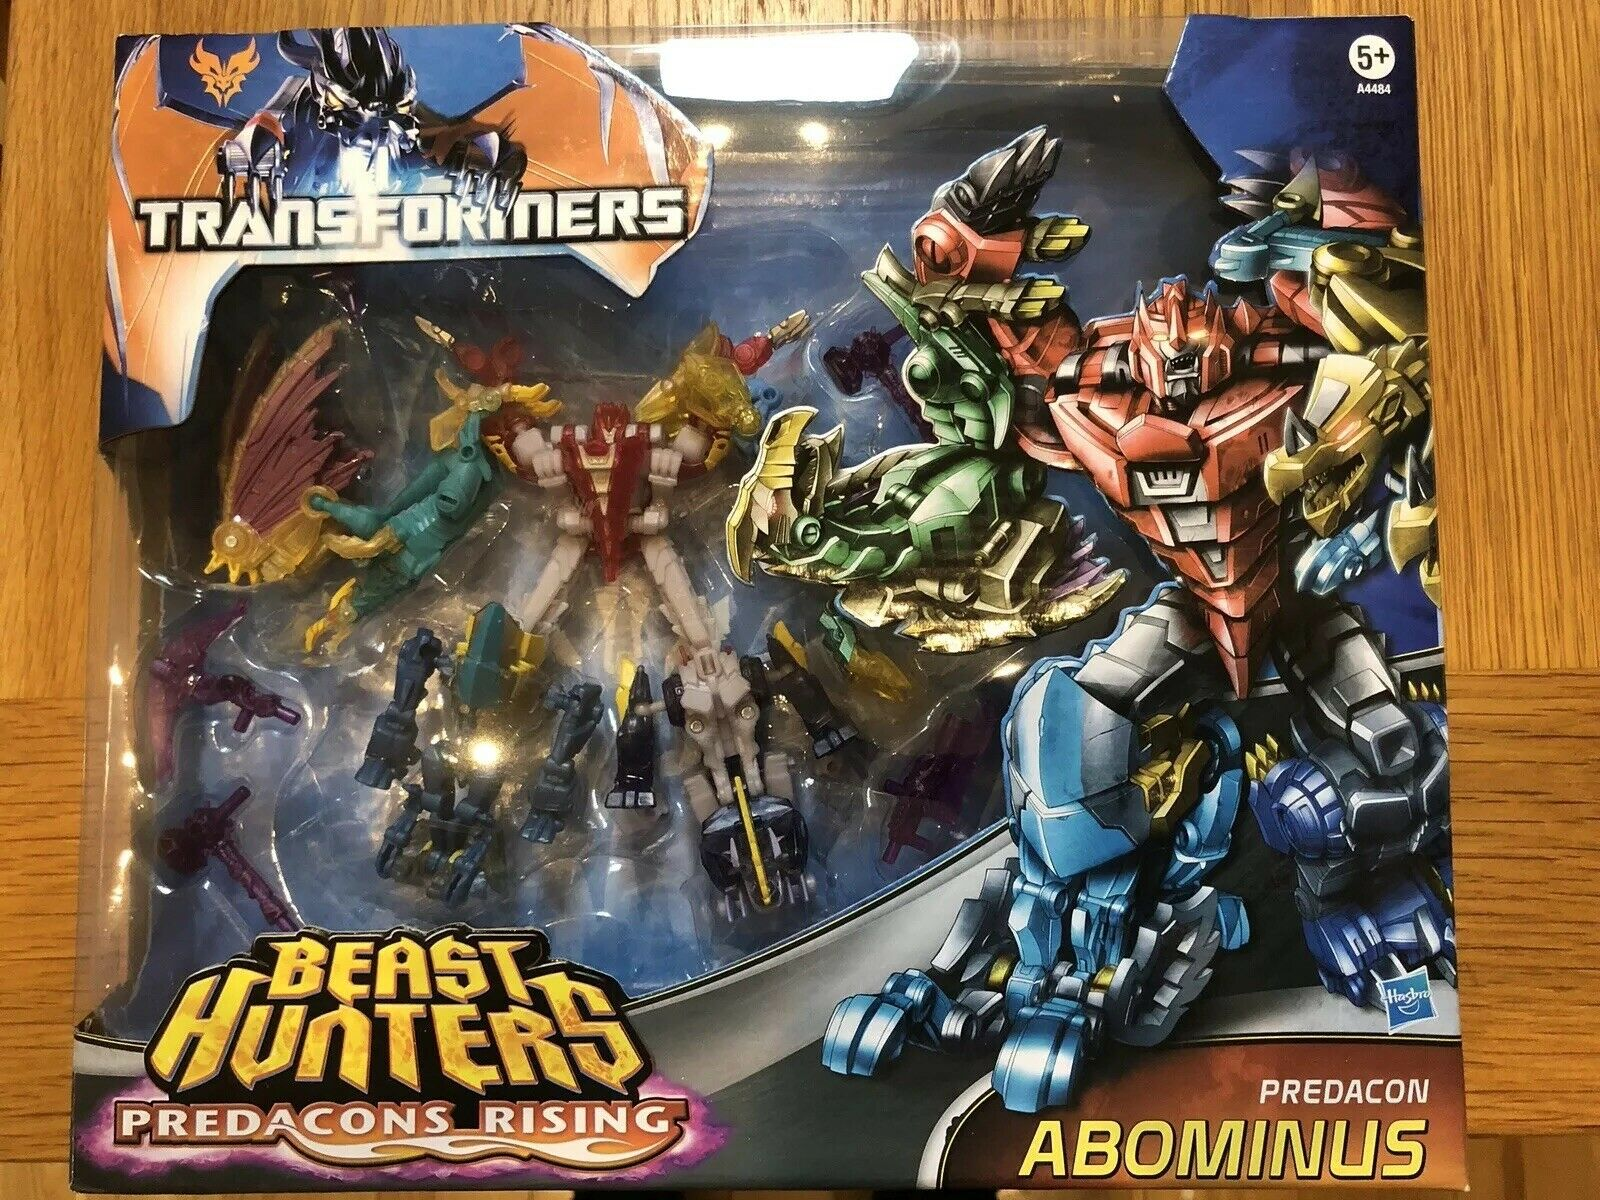 Transformers PRIME BEAST HUNTERS pedacons Rising ABOMINUS